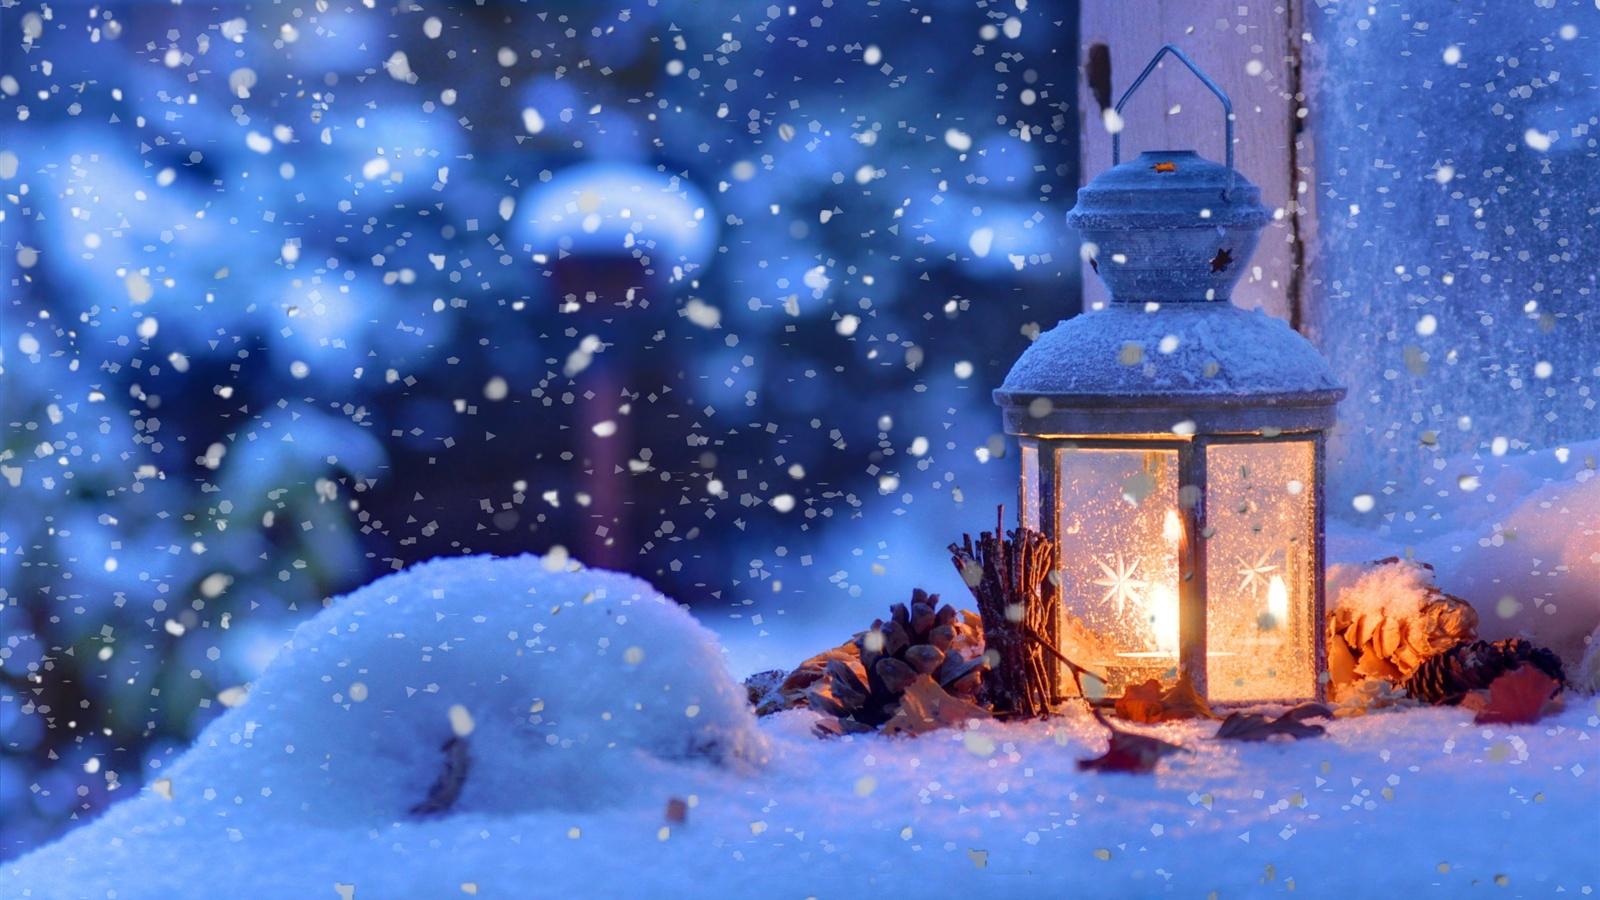 1600x900 hd desktop wallpaper winter - photo #7